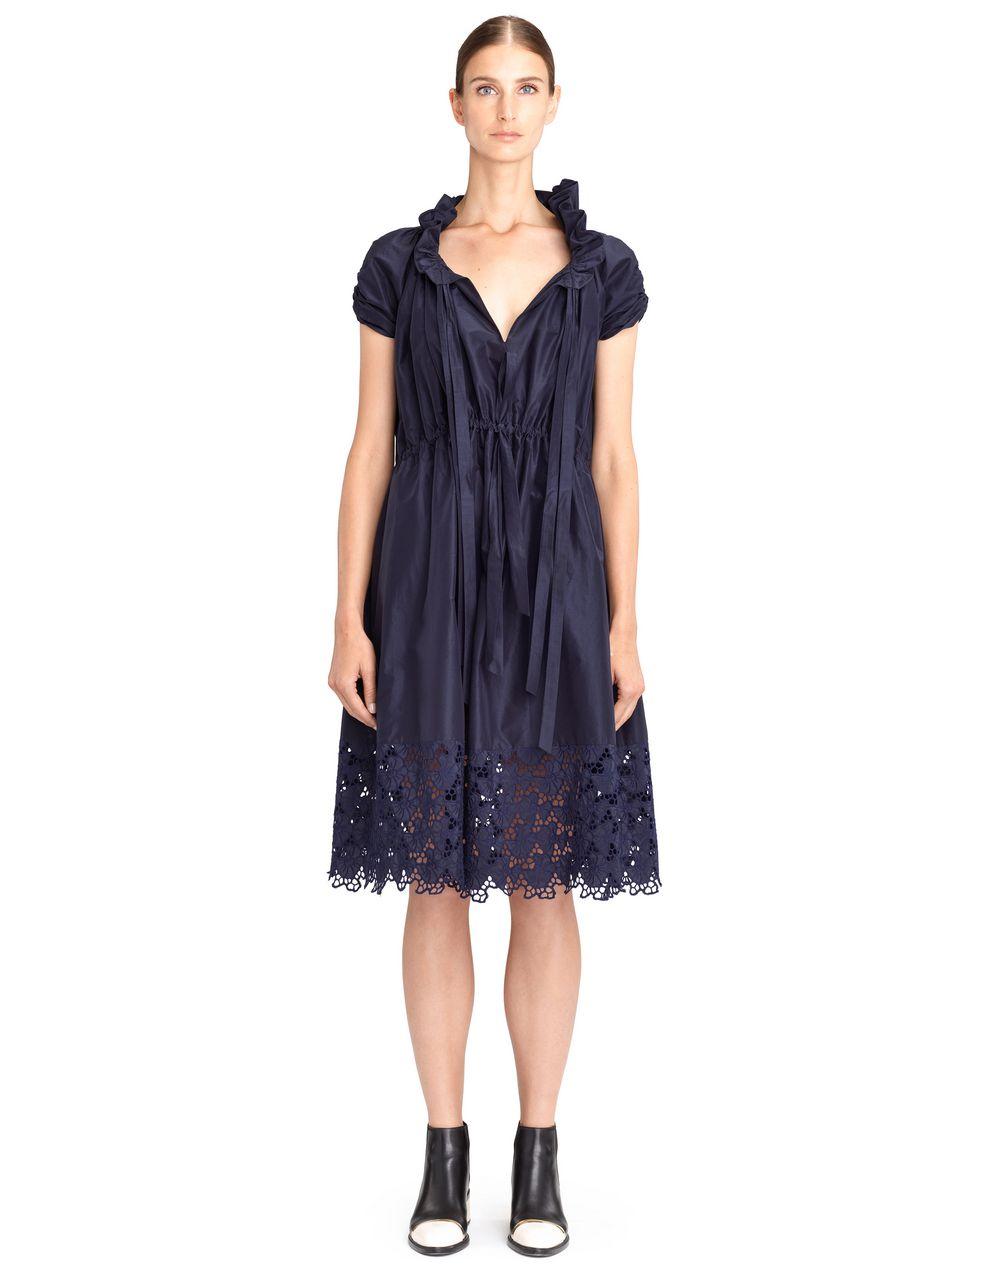 POPLIN EMBROIDERED DRESS - Lanvin